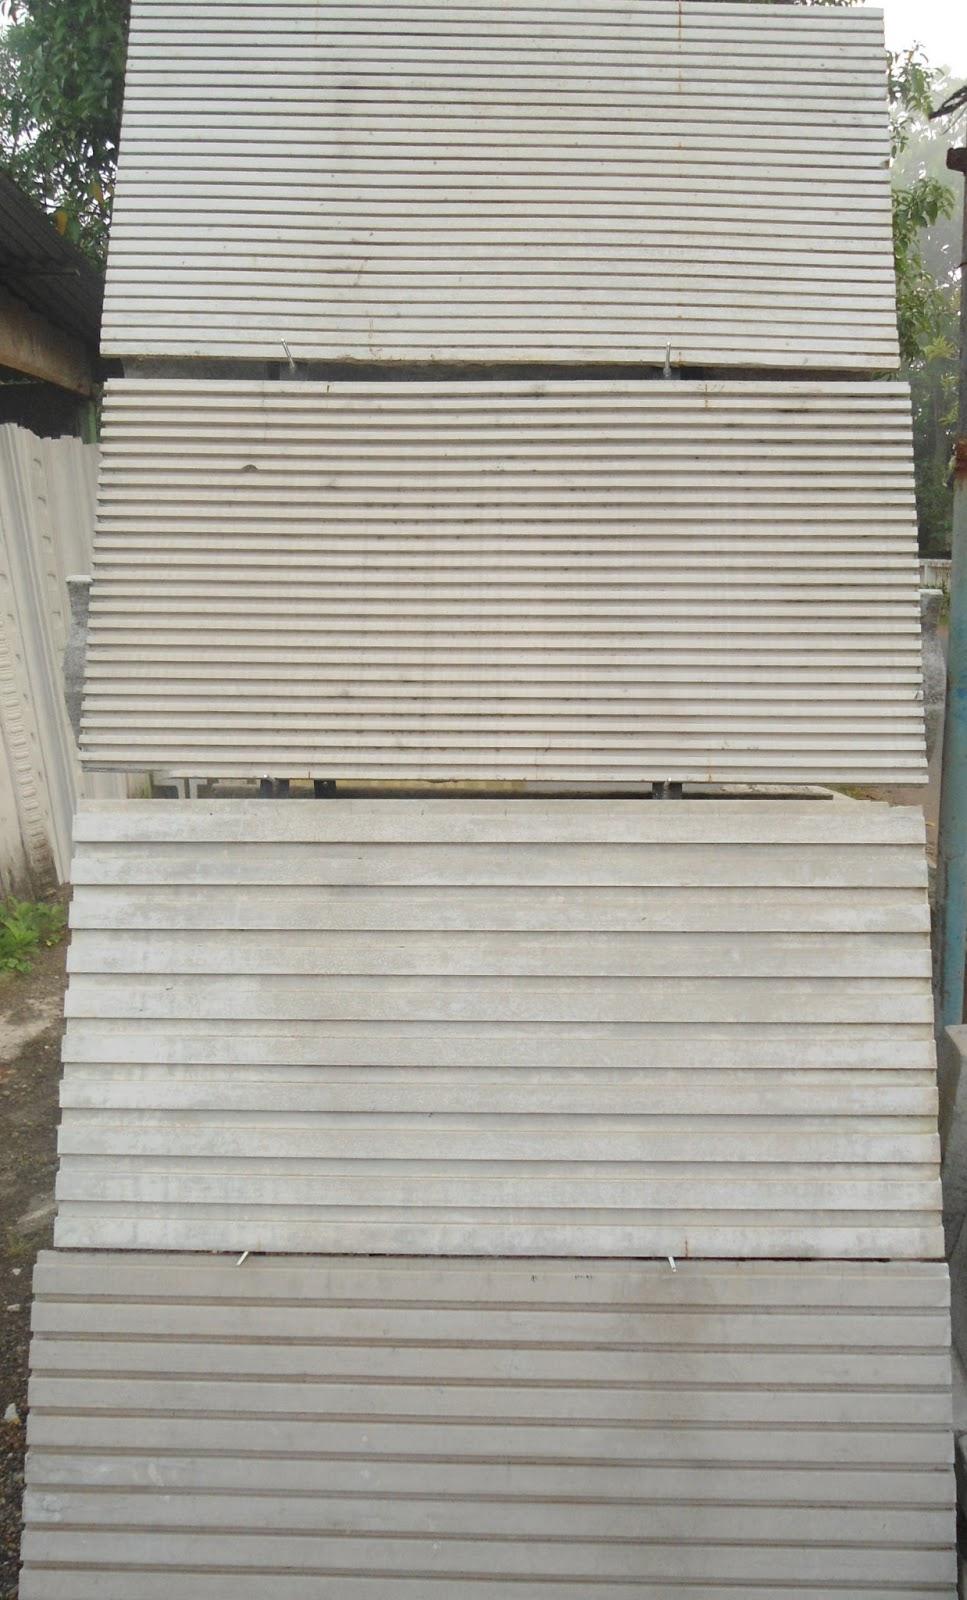 sanjaya profil beton alur dinding